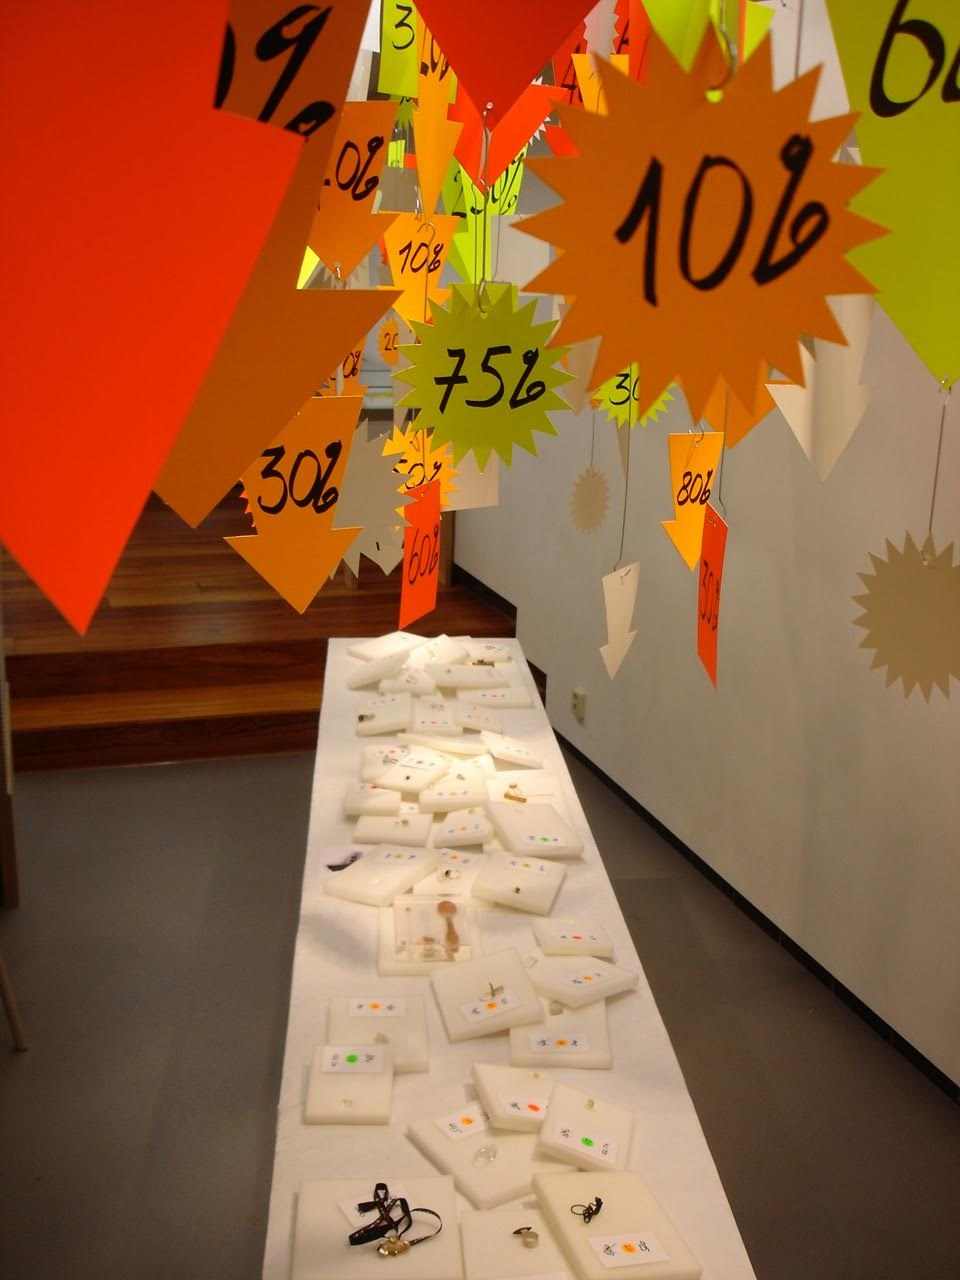 Impulsen, Week 1, Ted Noten, sales, Galerie Rob Koudijs, 2008, tentoonstelling